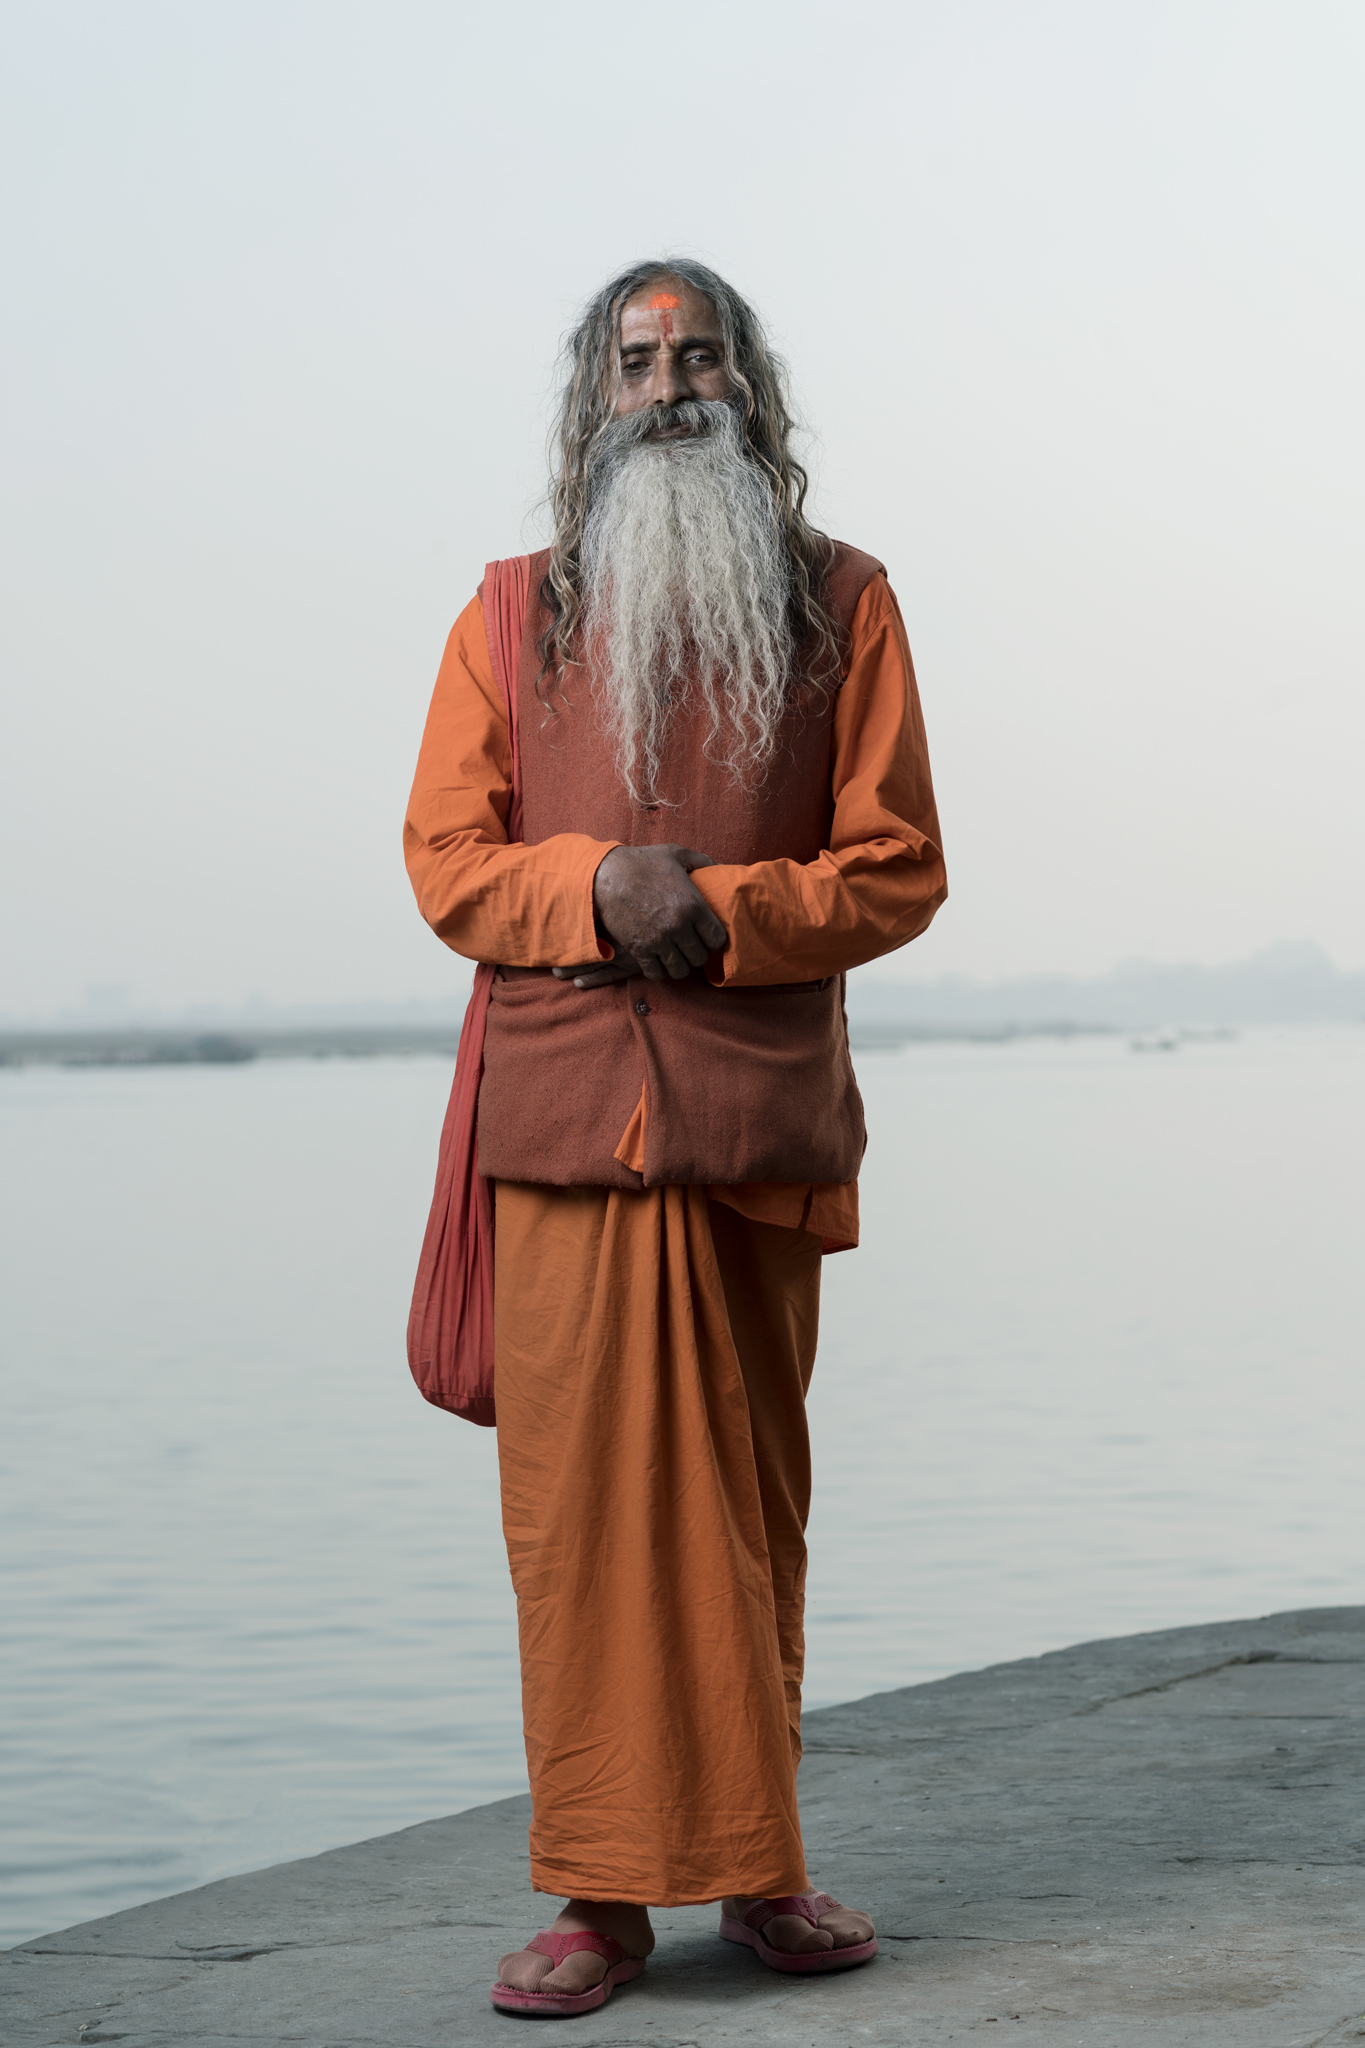 Varanasi_portrait_travel_photography_Manchester_Adventure_Photographer_Jan_Bella35.jpg